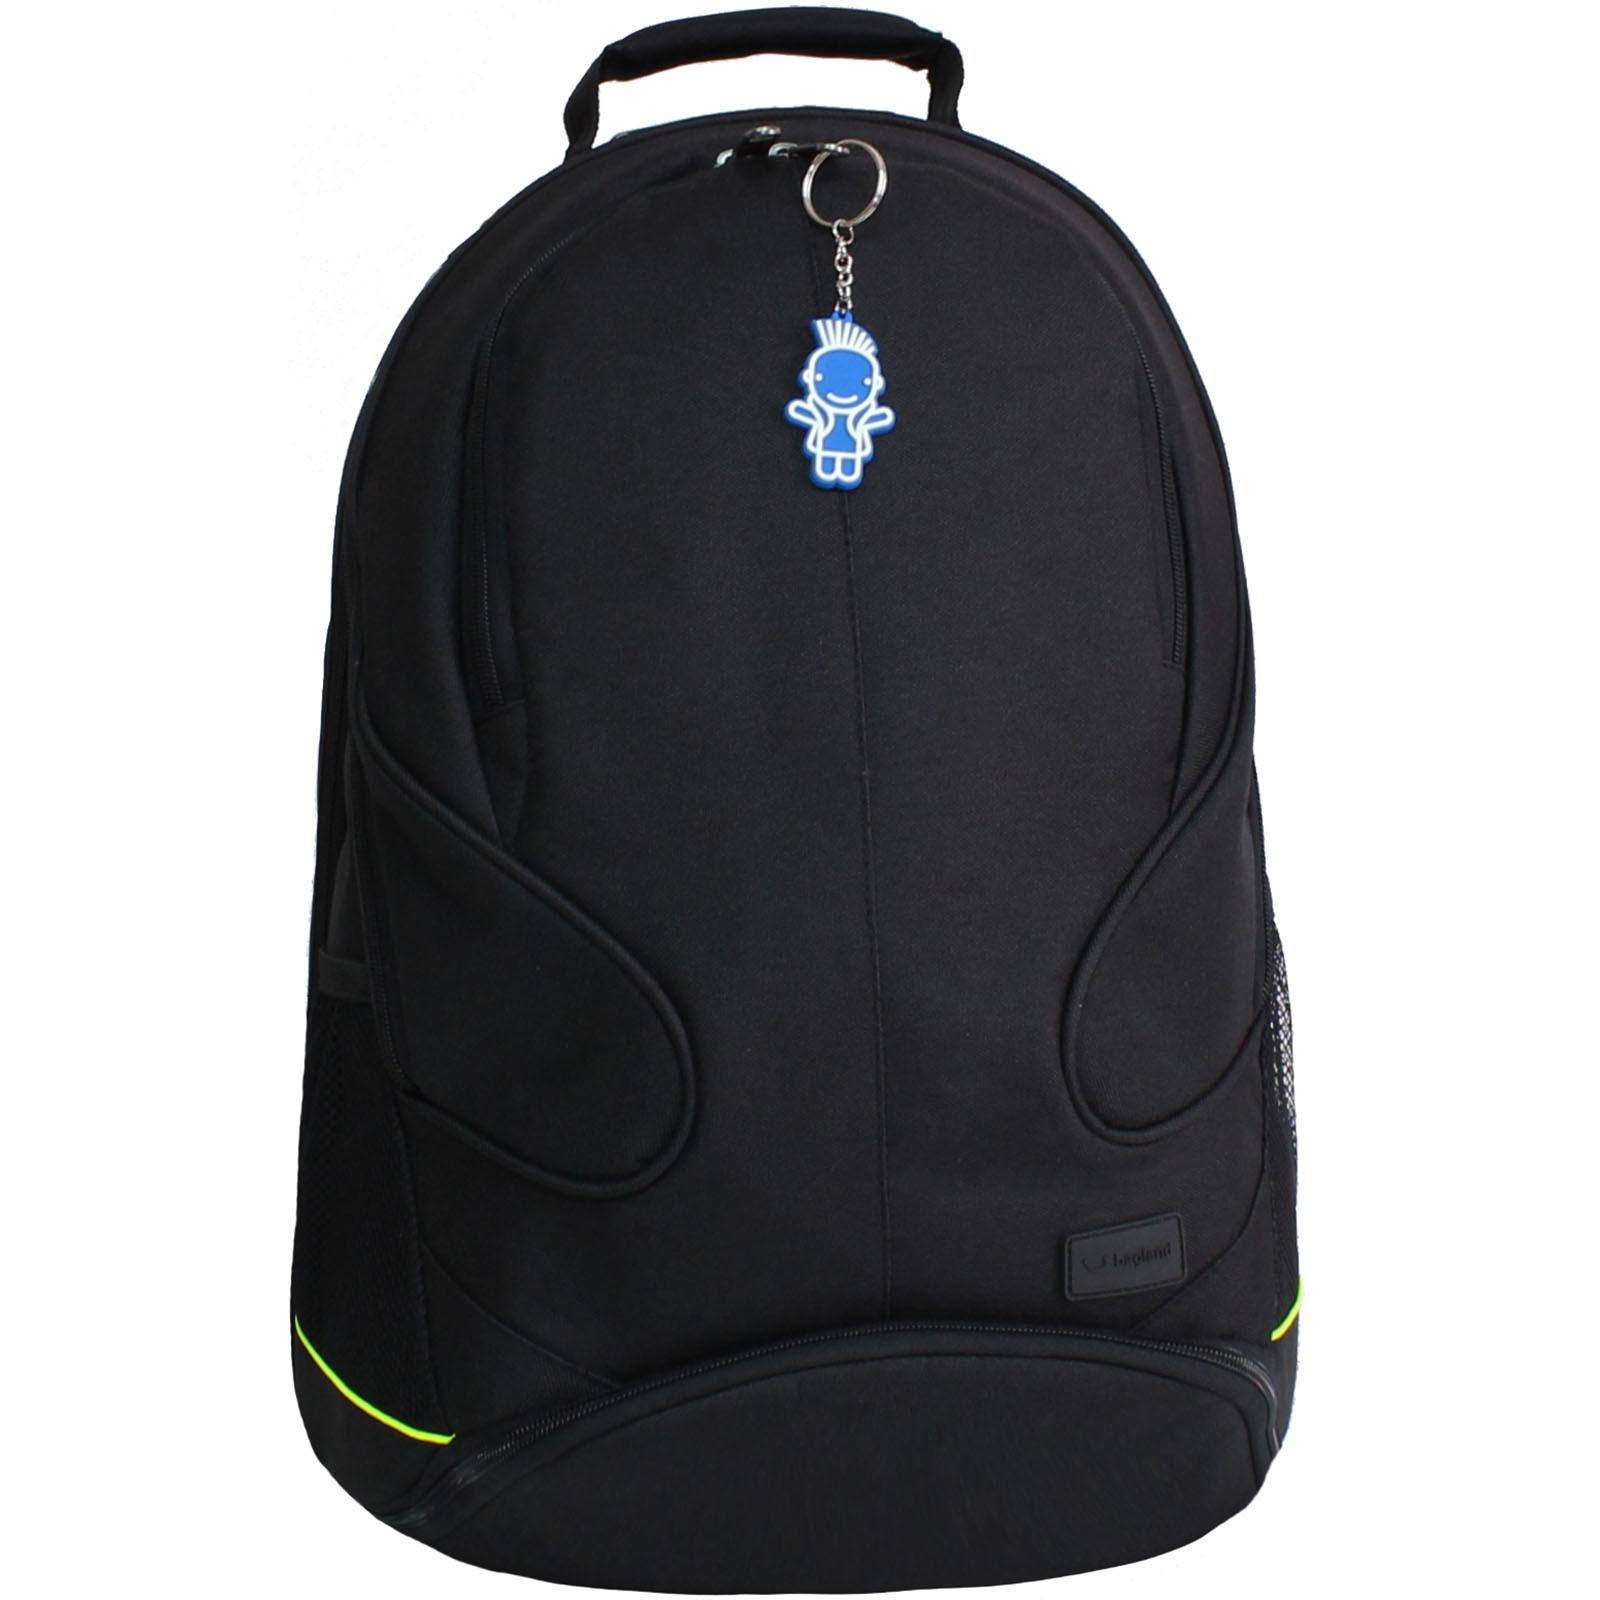 Рюкзаки для ноутбука Рюкзак для ноутбука Bagland Рюкзак ZOOTY 24 л. Чёрный (00531662) IMG_8907.JPG